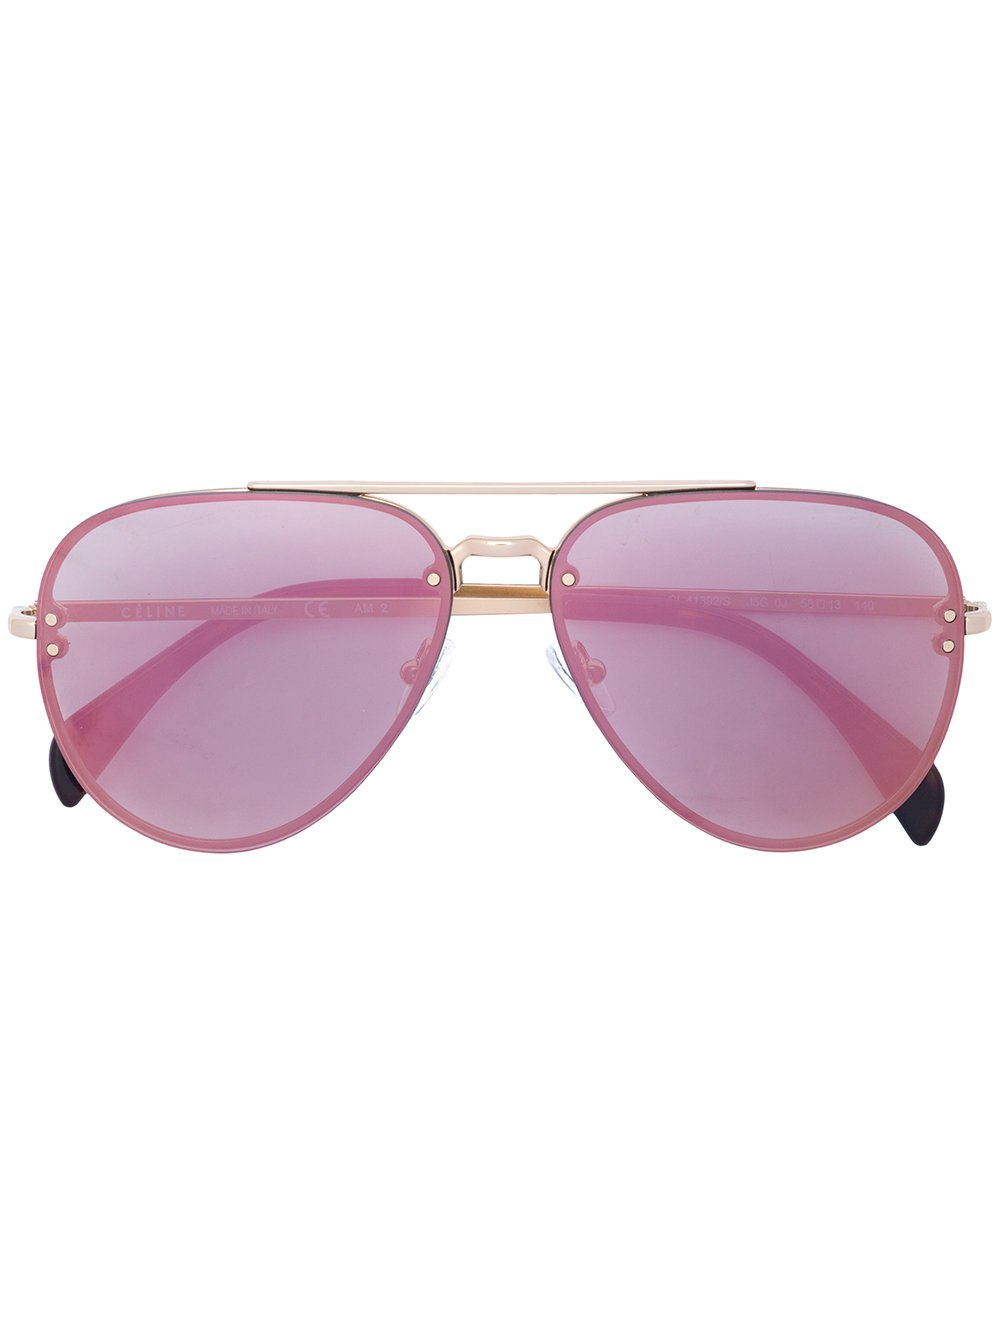 109fccf59bbc Fake Celine Mirrored Sunglasses Uk